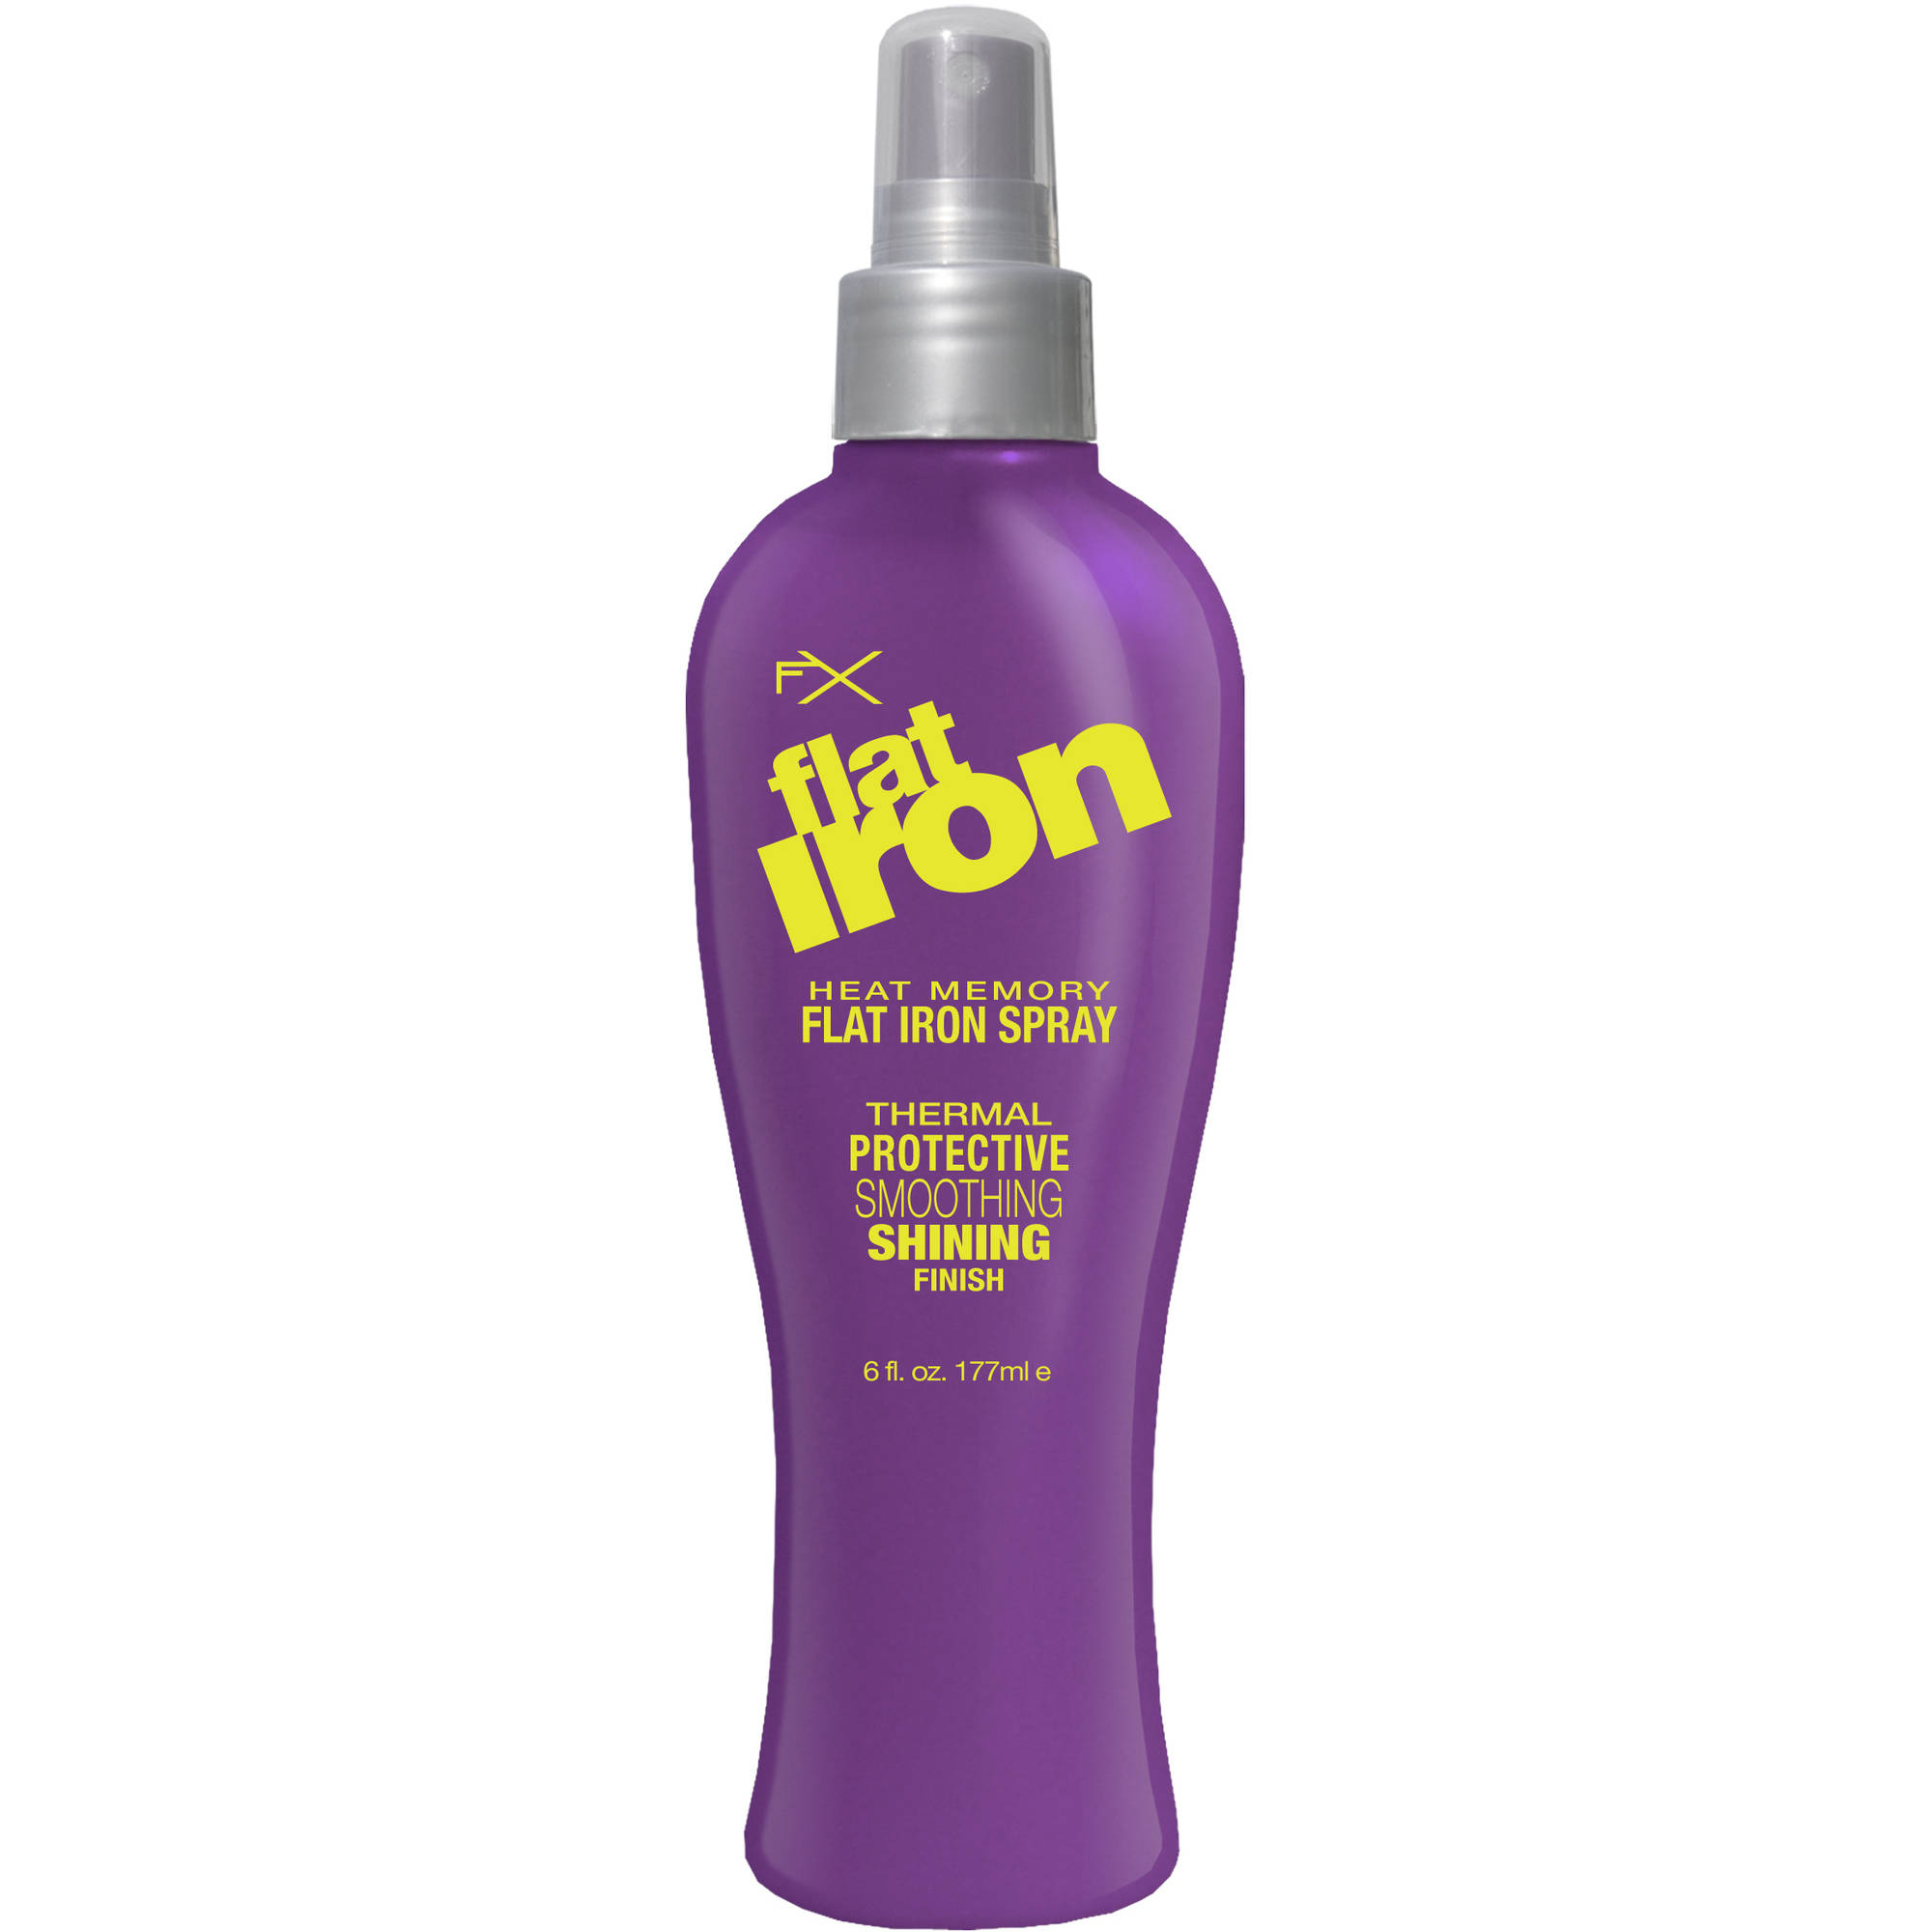 Fx Special Effects Sheer Silky Smooth Heat Memory Flat Iron Spray, 6 fl oz